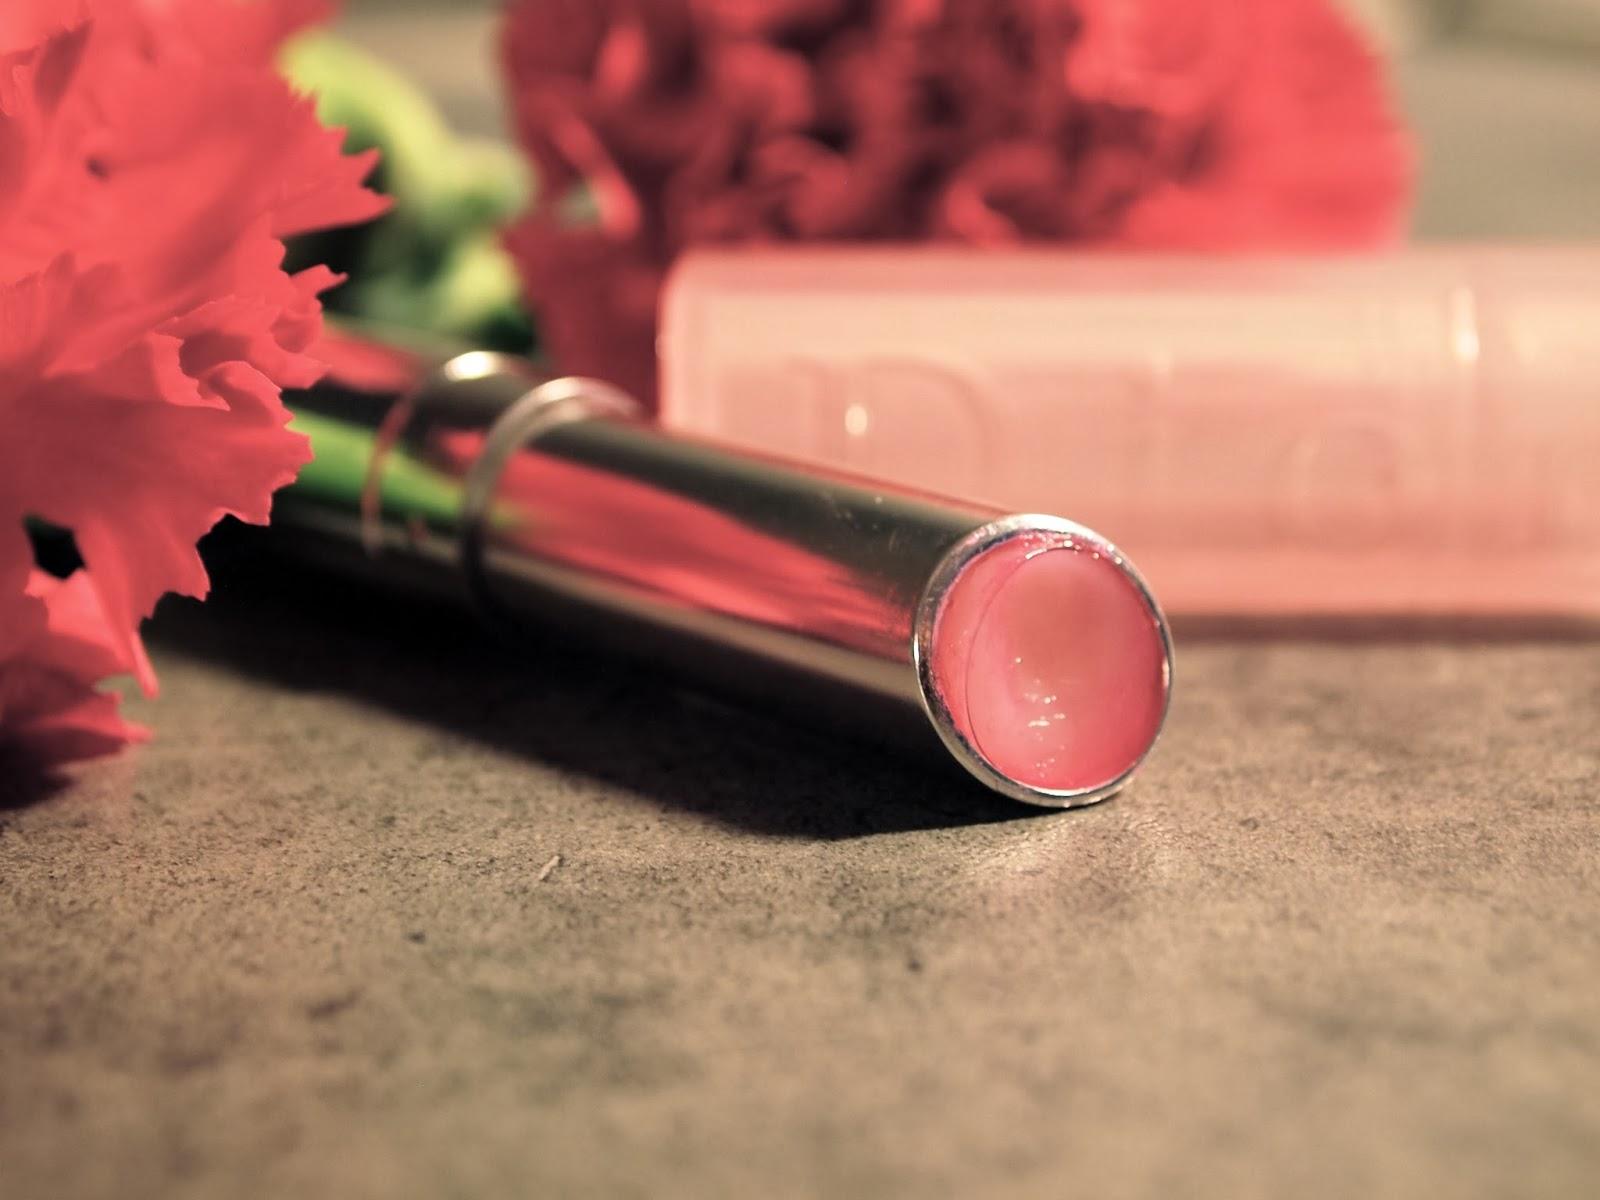 Dior Lip Glow